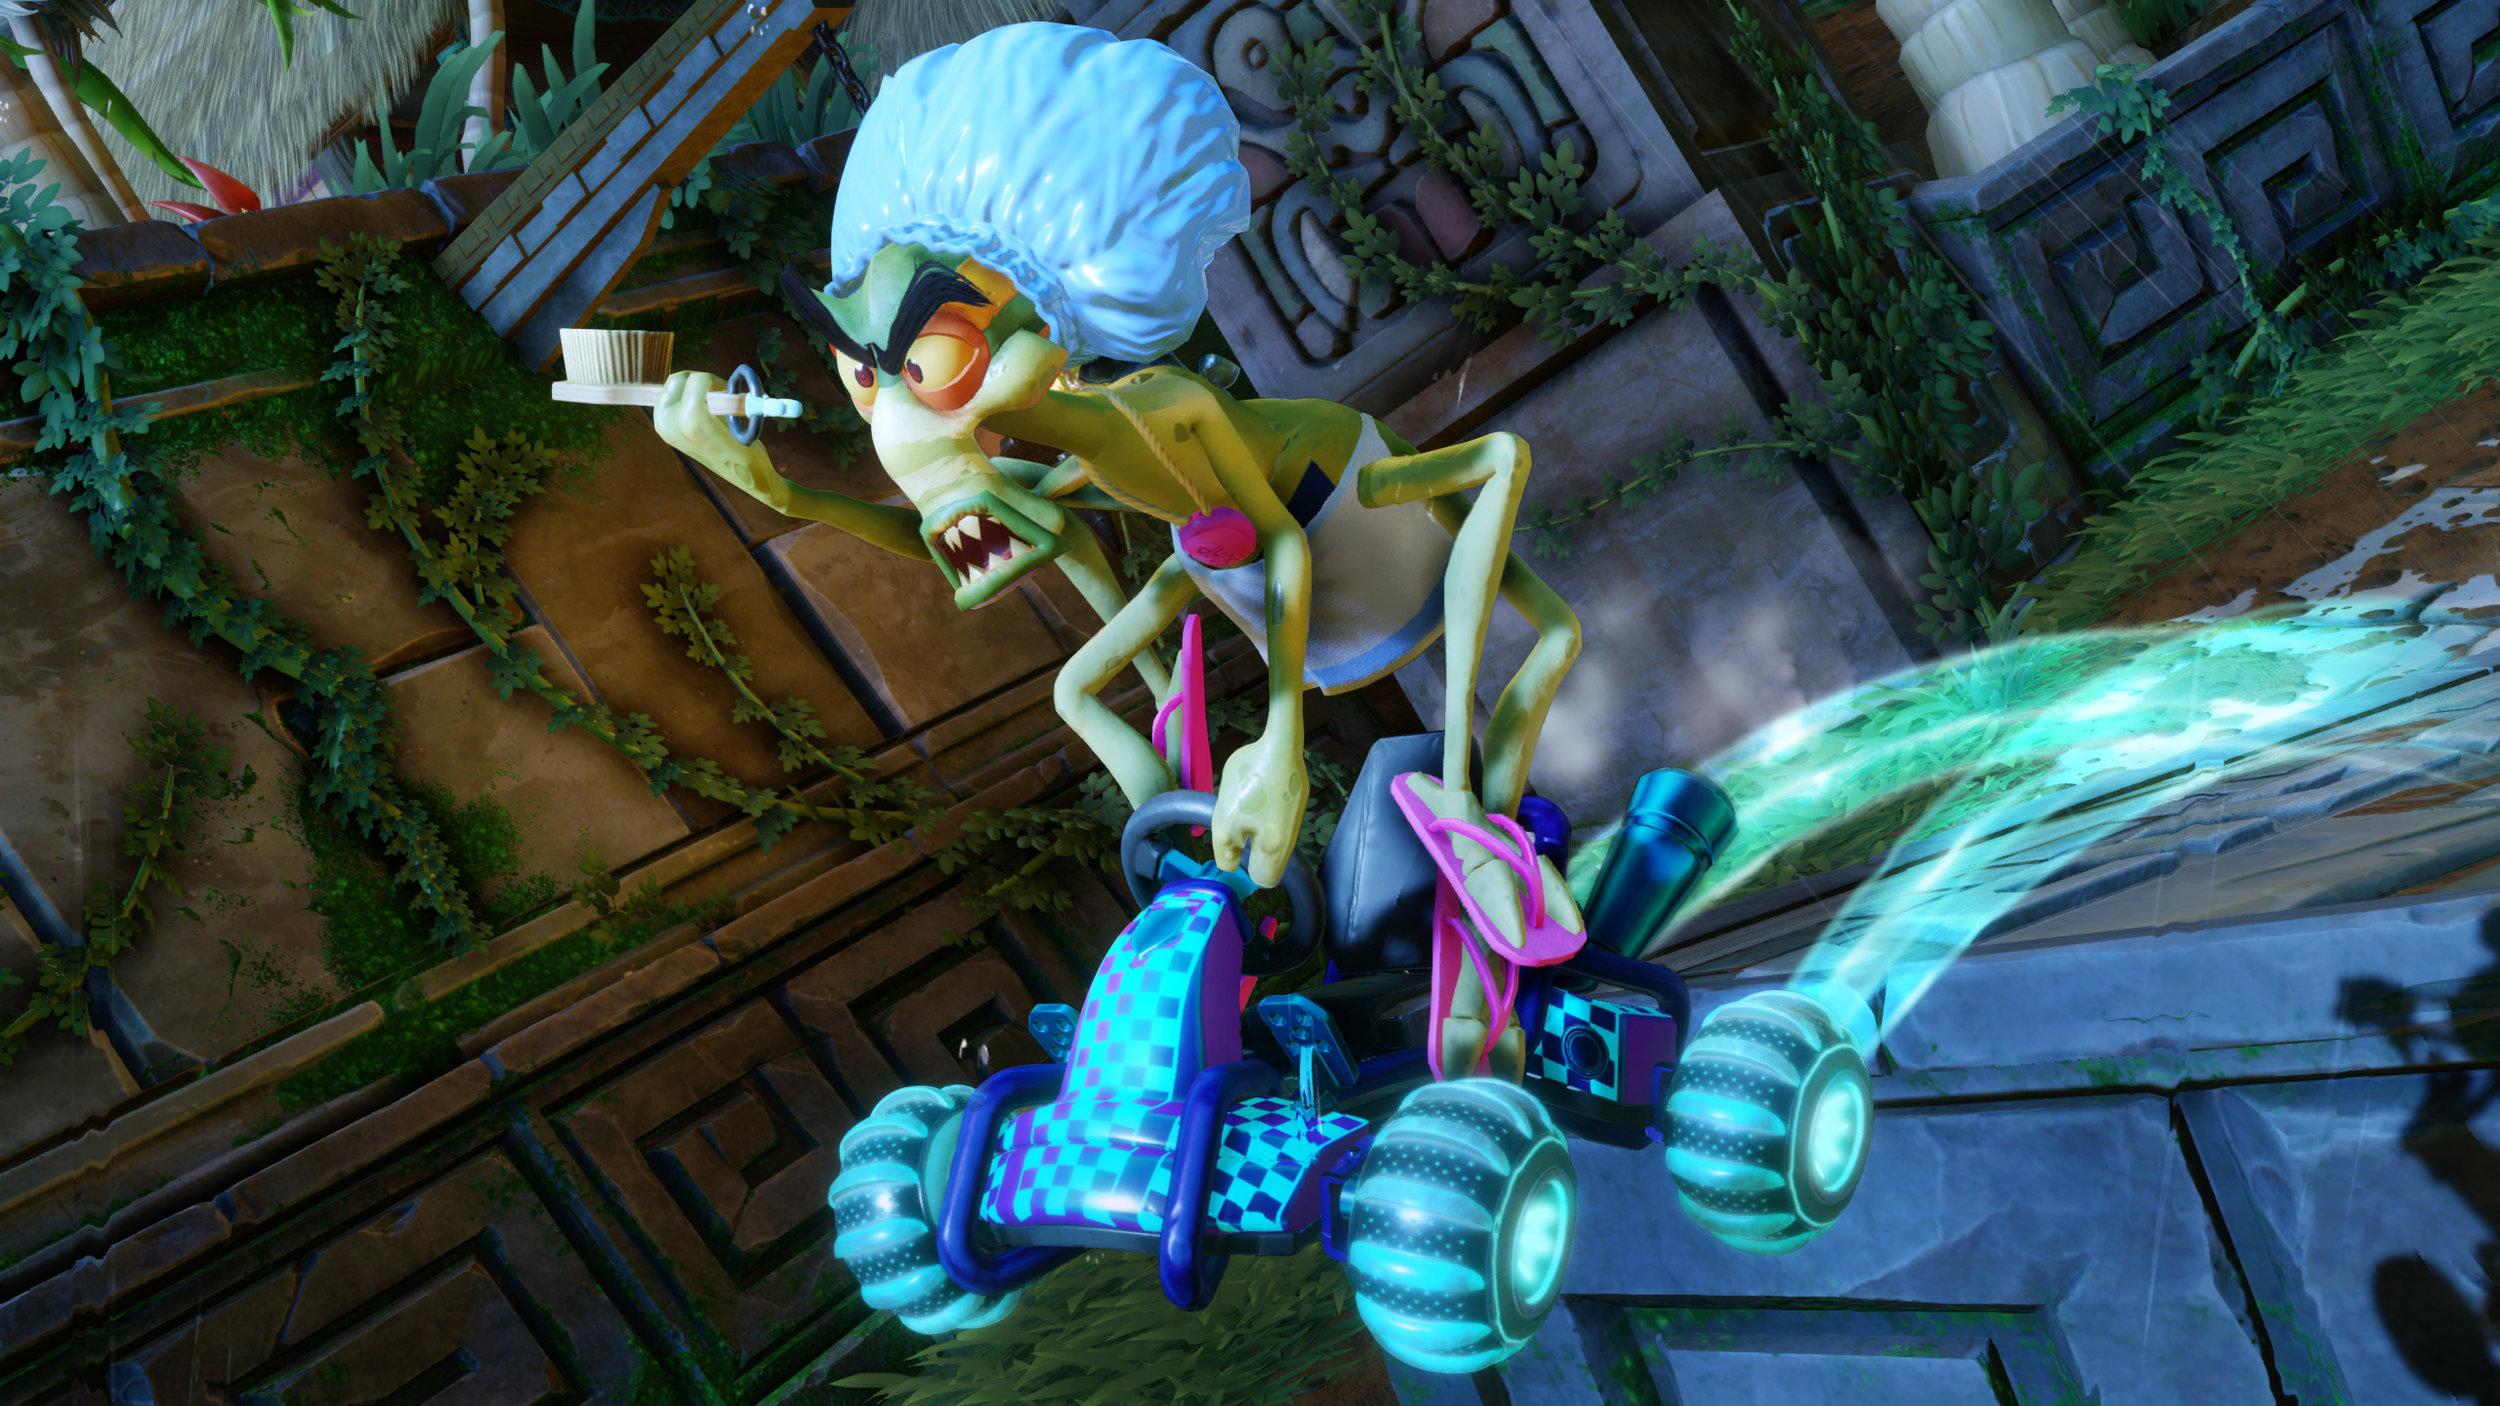 Crash Team Racing Nitro-Fueled Screen 6.jpg